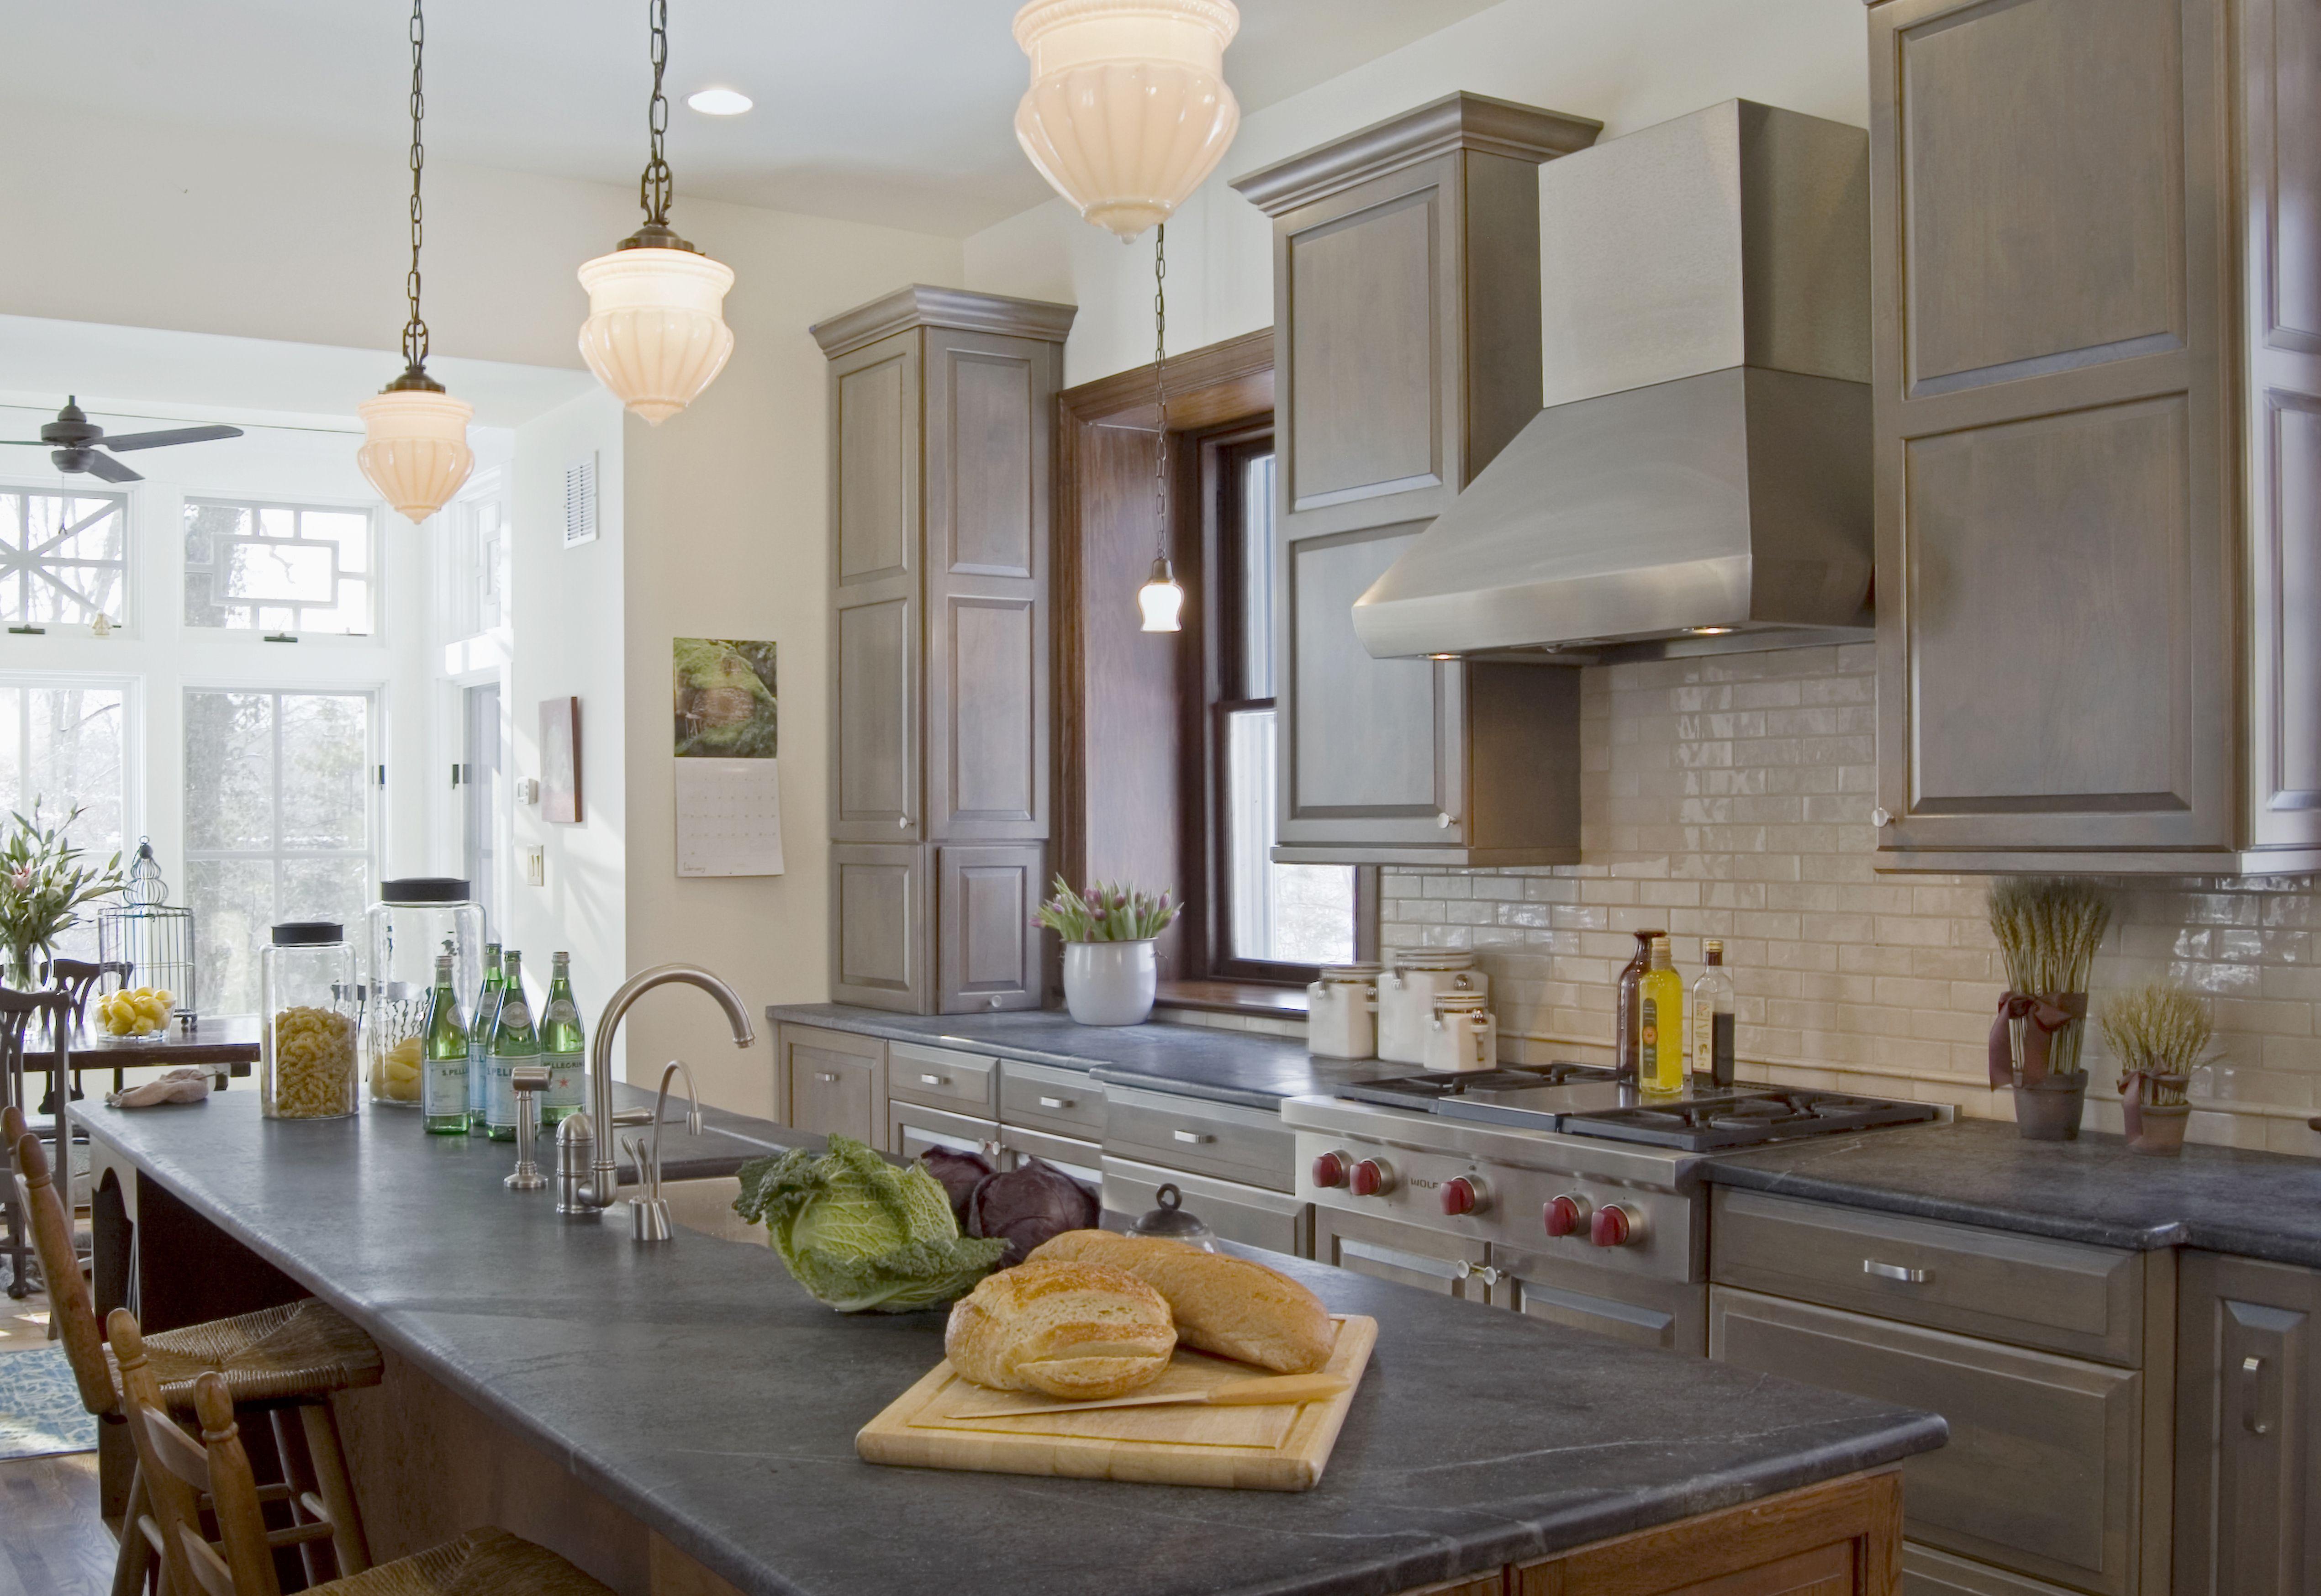 My Perfect Kitchen Finish Wise Gray Cabinets Gray Soapstone Countertops White Subway Tile Modern White Kitchen Cabinets Kitchen Remodel Traditional Kitchen